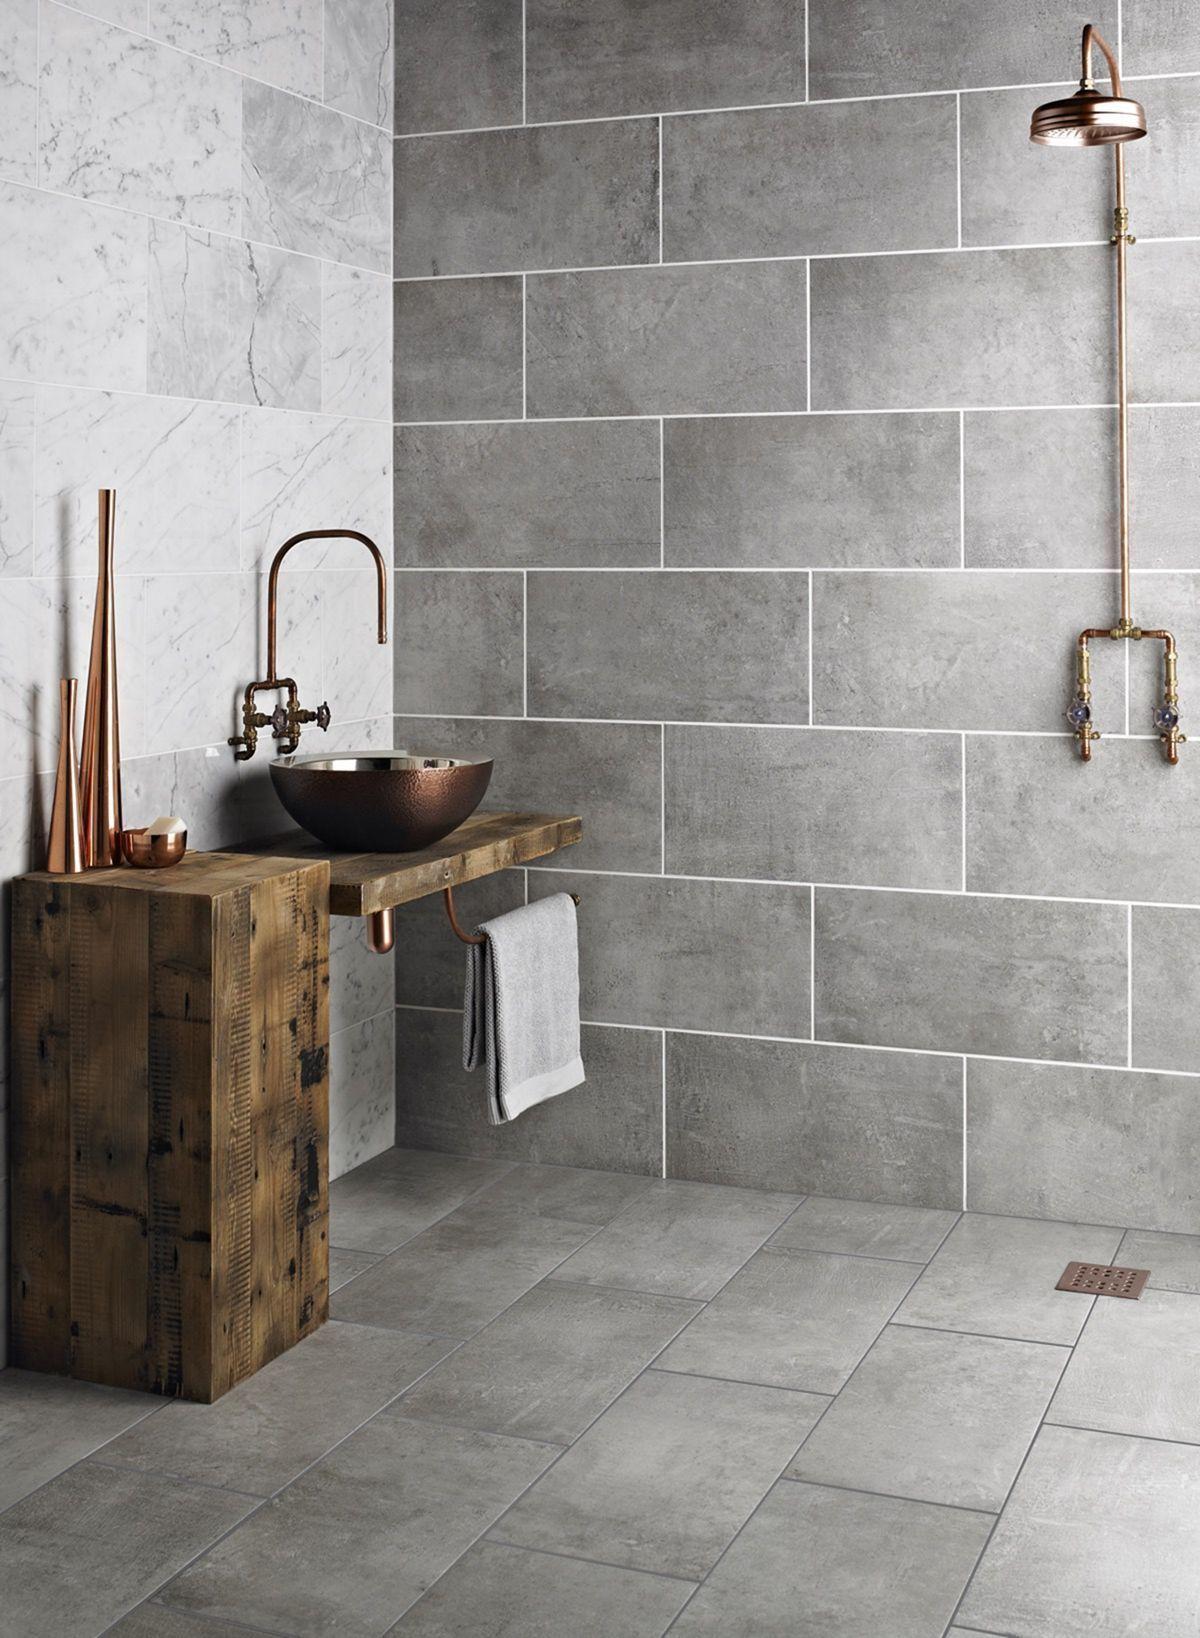 15 Wunderschone Industrielle Badezimmer Dekoration Ideen Die Beliebtesten Epische 15 Wunderschone In In 2020 Industriedesign Badezimmer Bad Styling Badezimmer Dekor